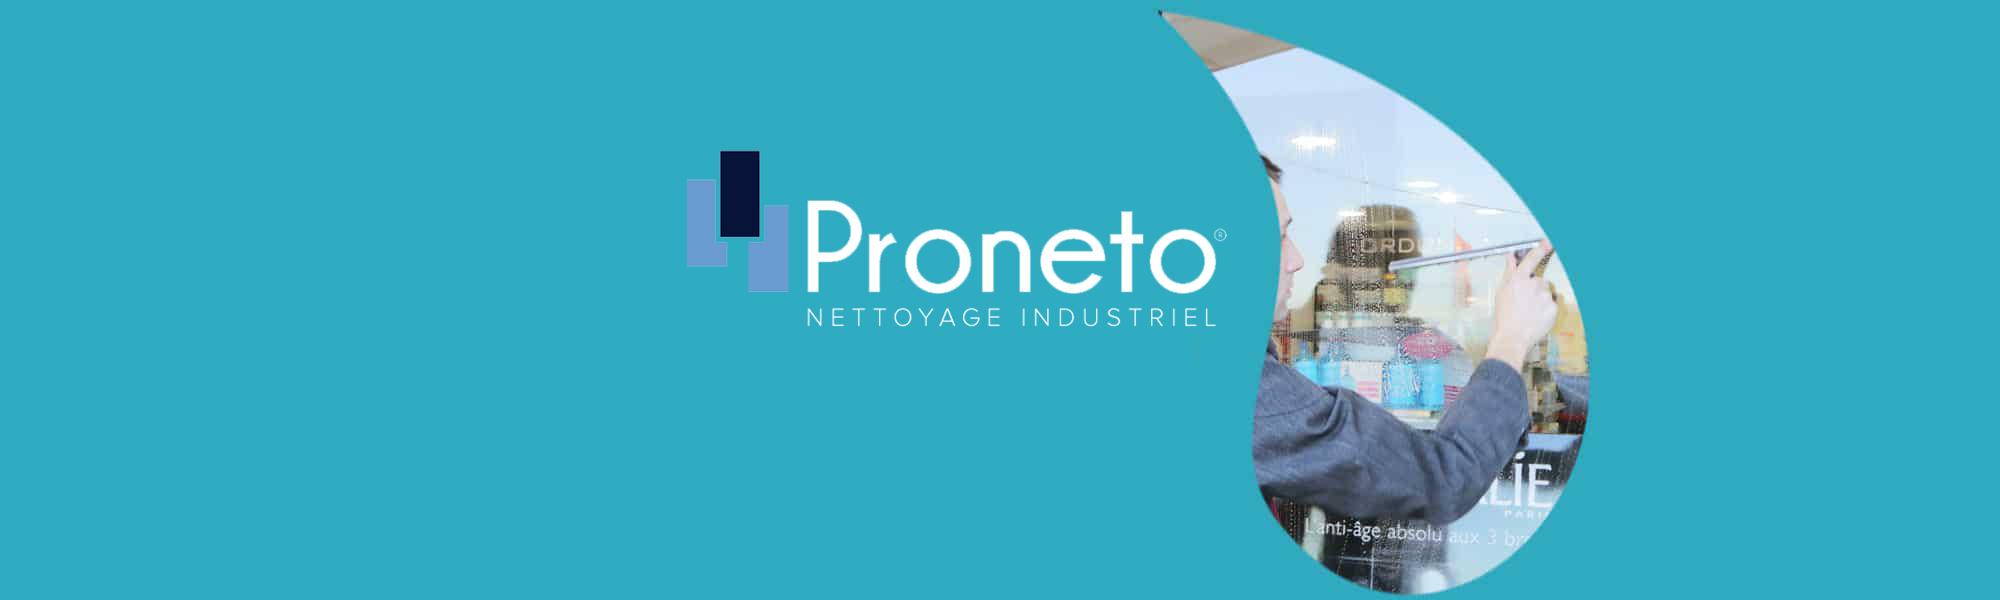 slide_proneto1